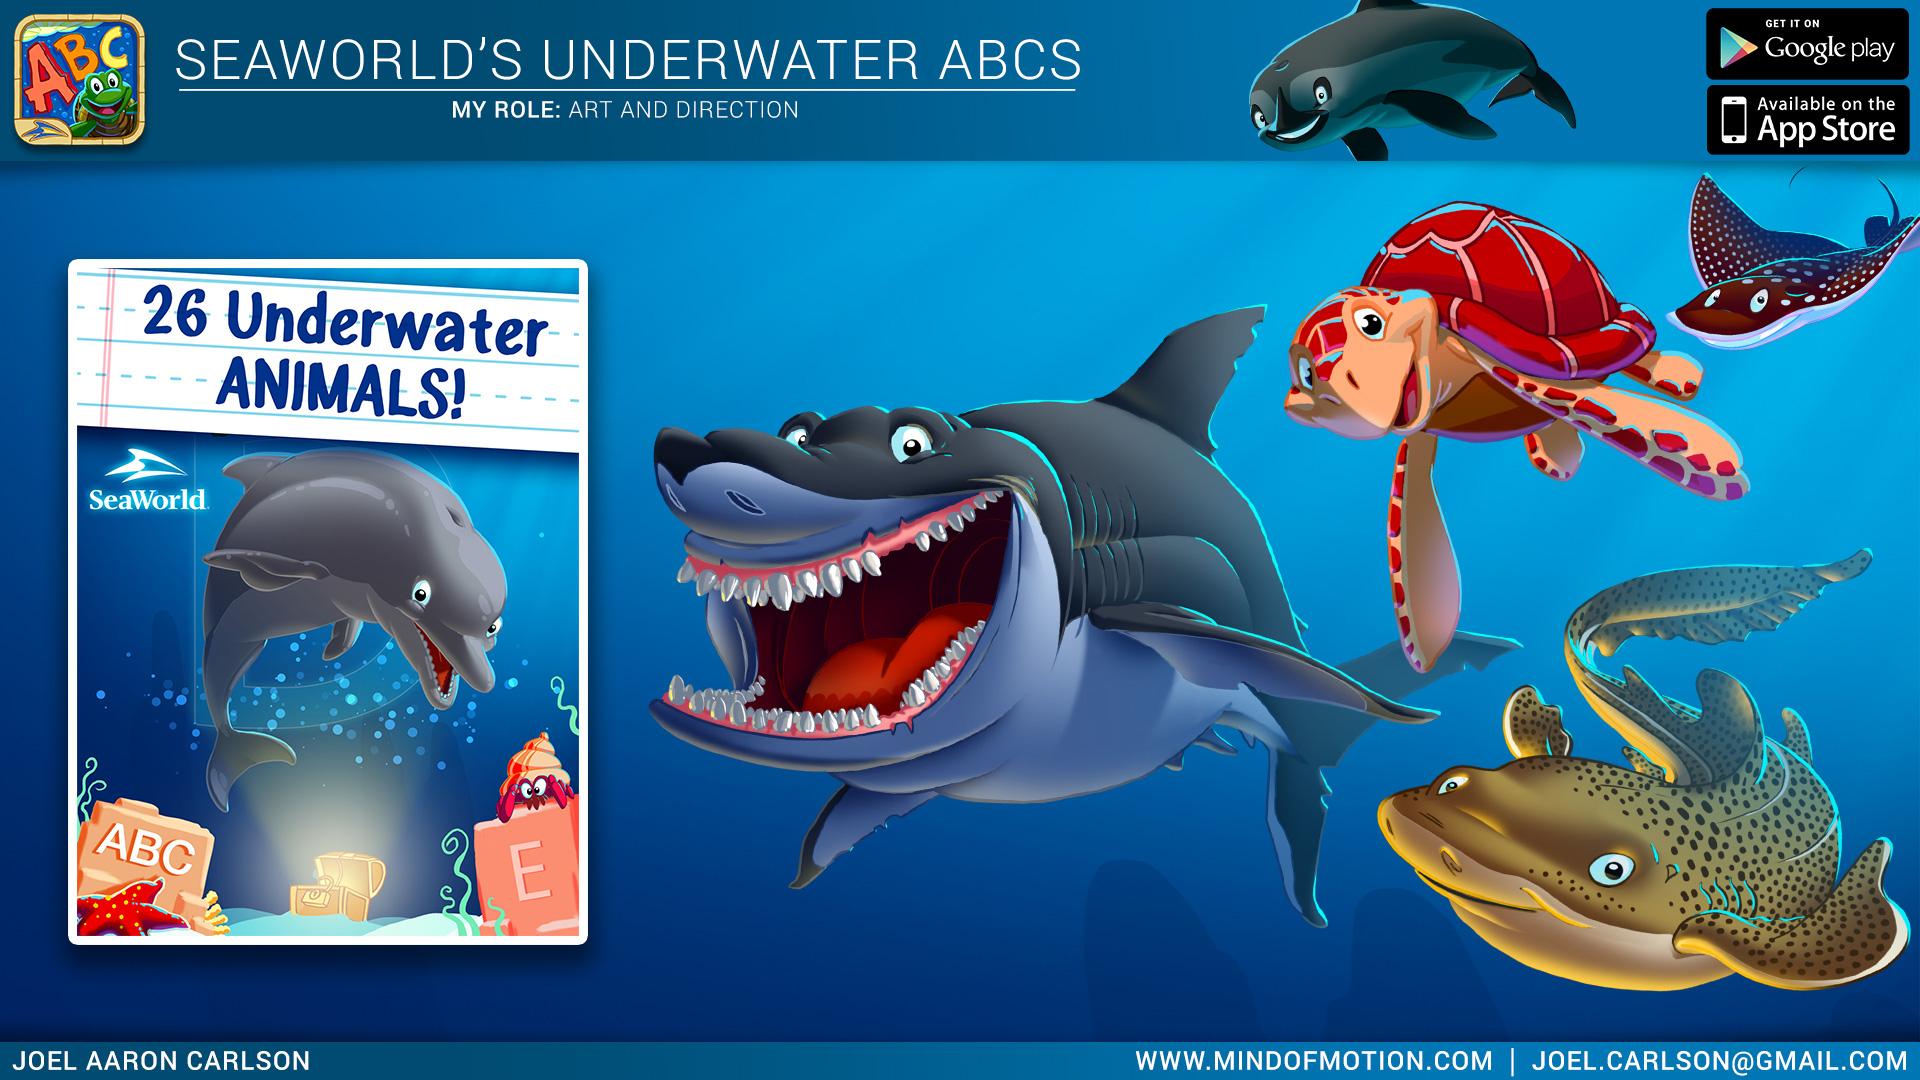 Portfolio-GameDevelopment-01-SeaWorldsUnderwaterABCs.jpg